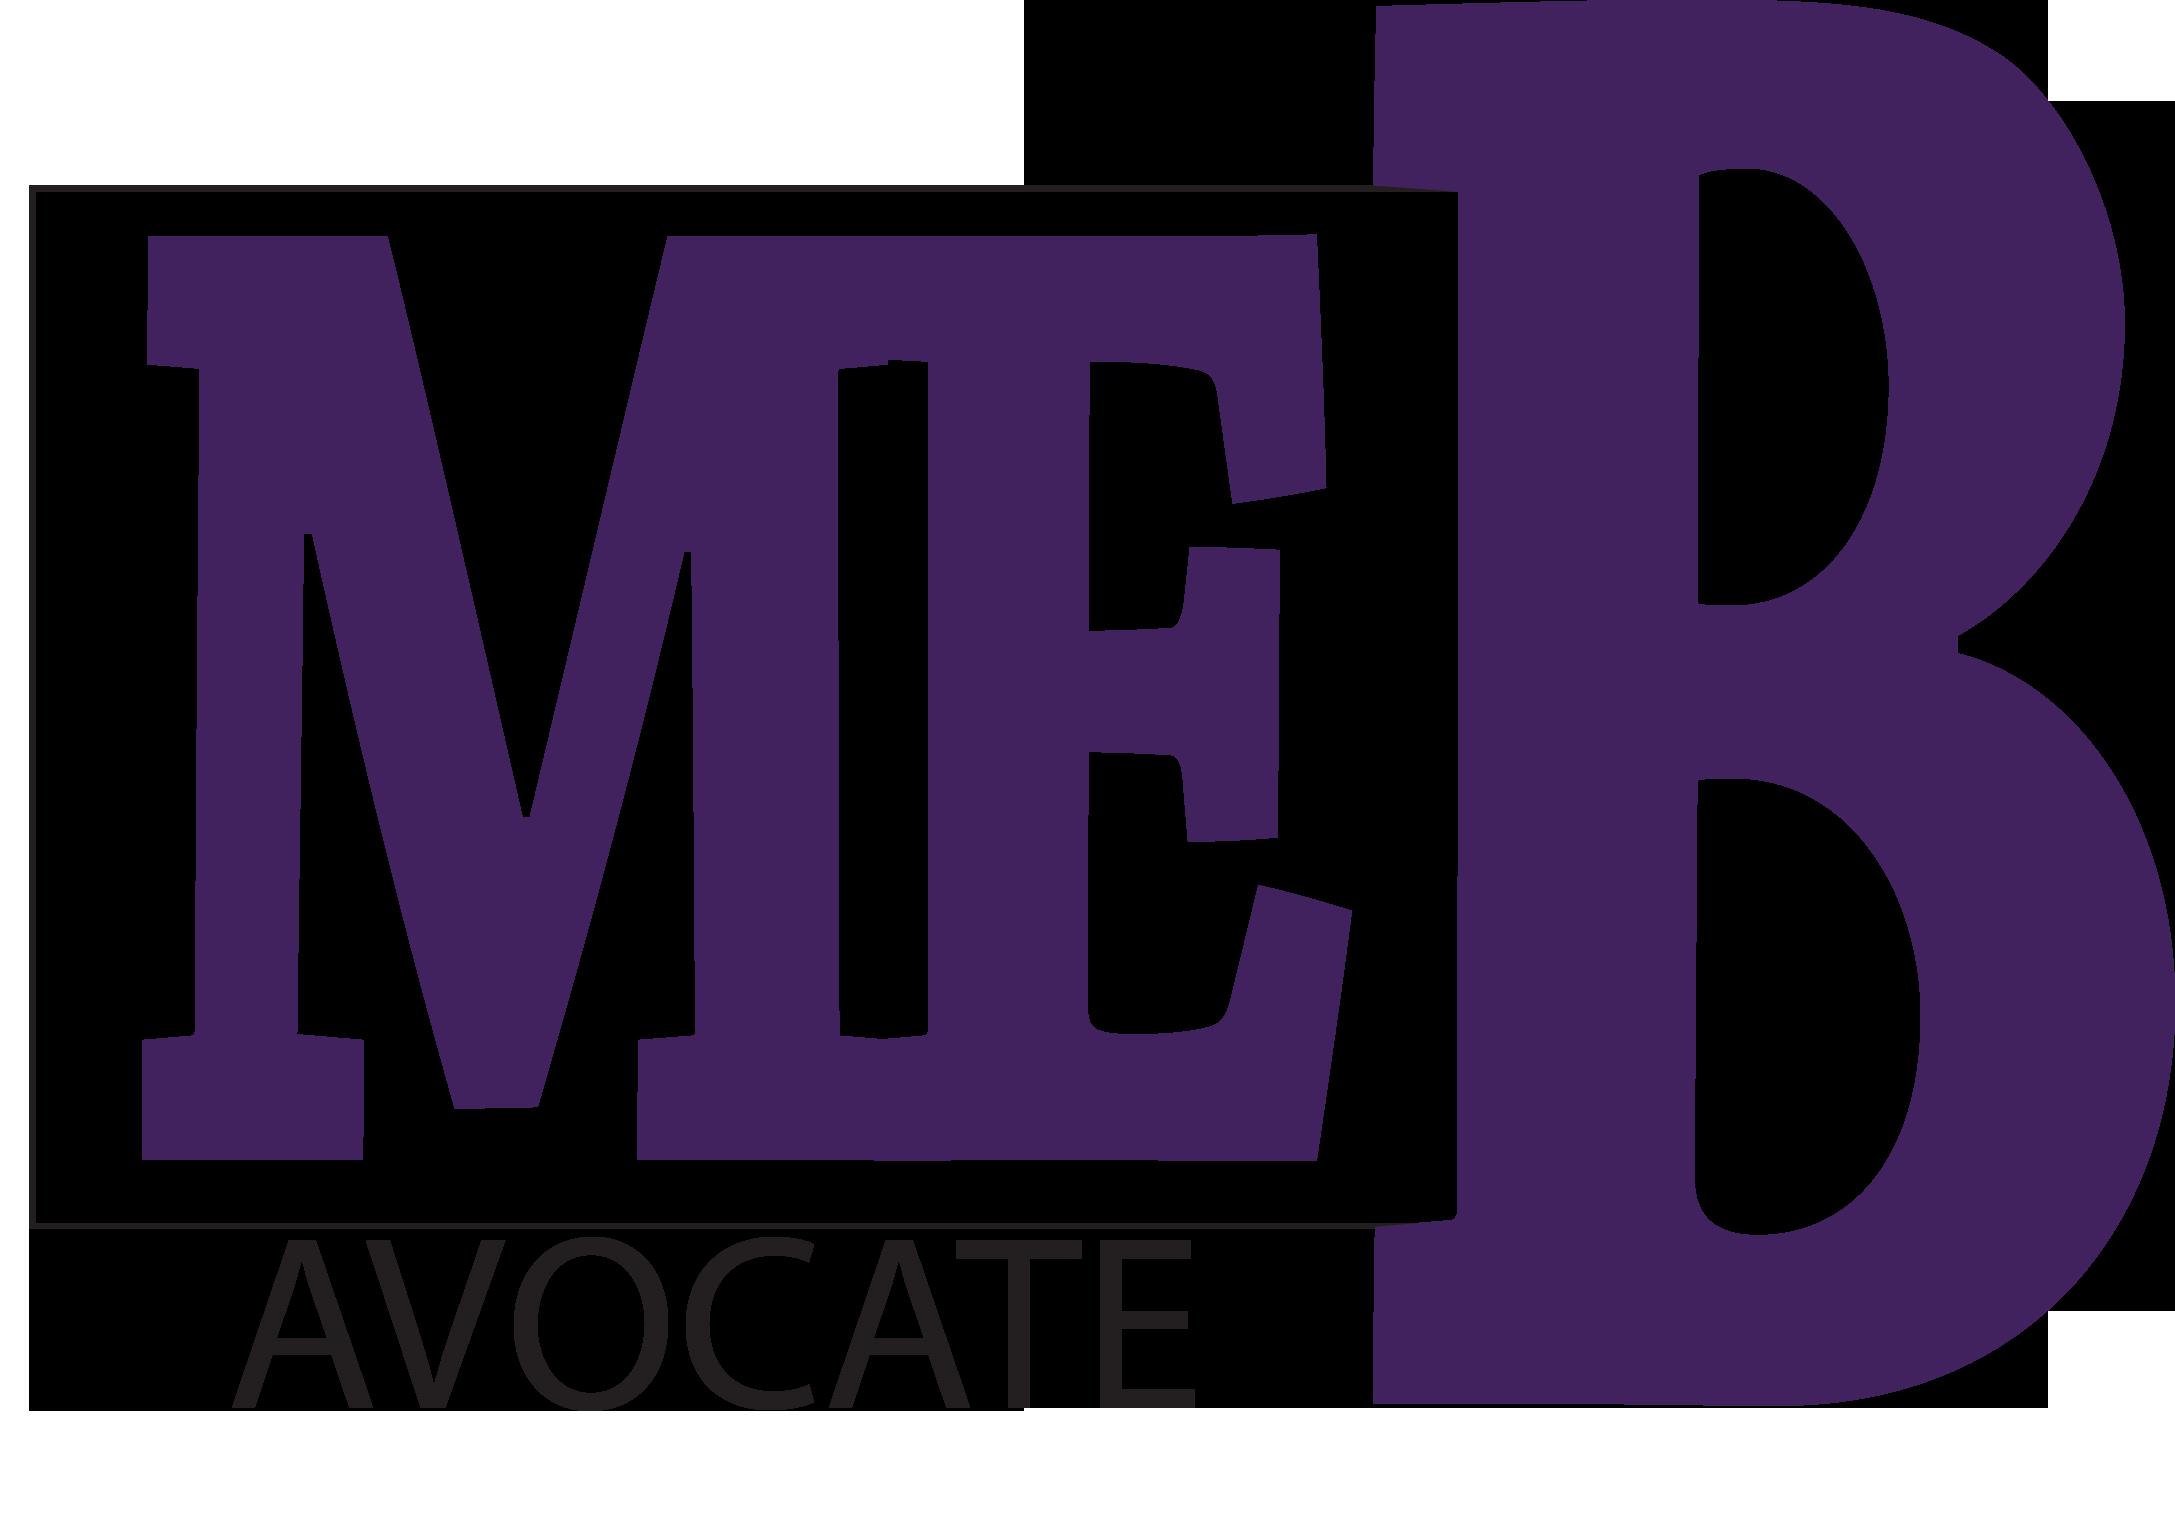 MEB Avocate